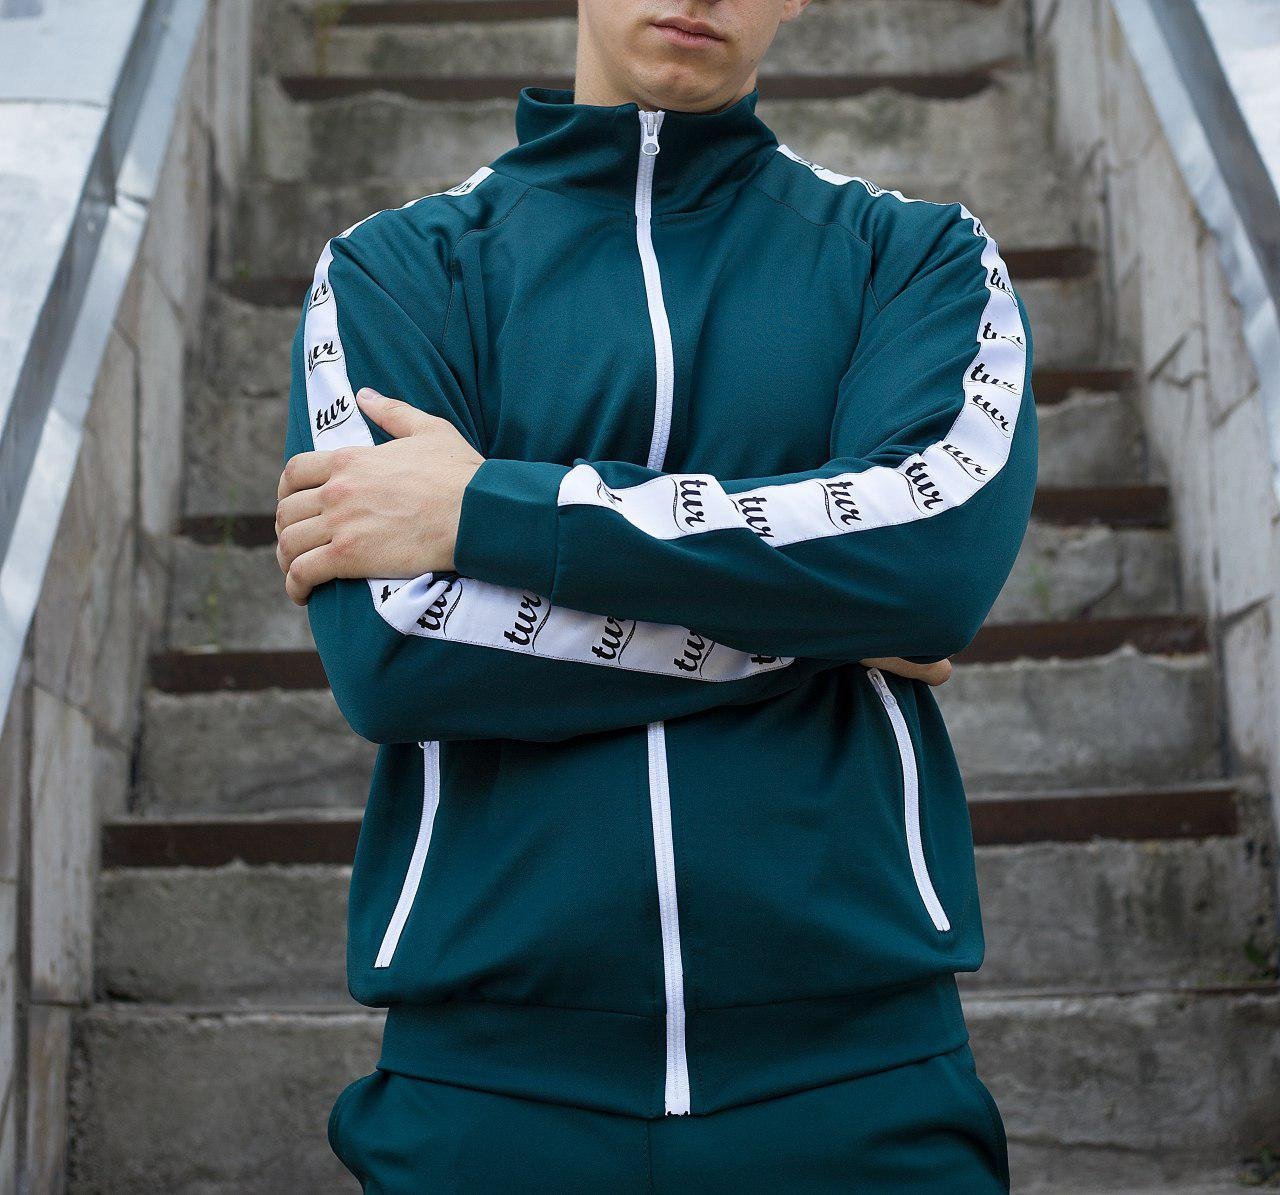 Мастёрка, олимпийка, мужская спортивная кофта Smoke (Смок) зелёная